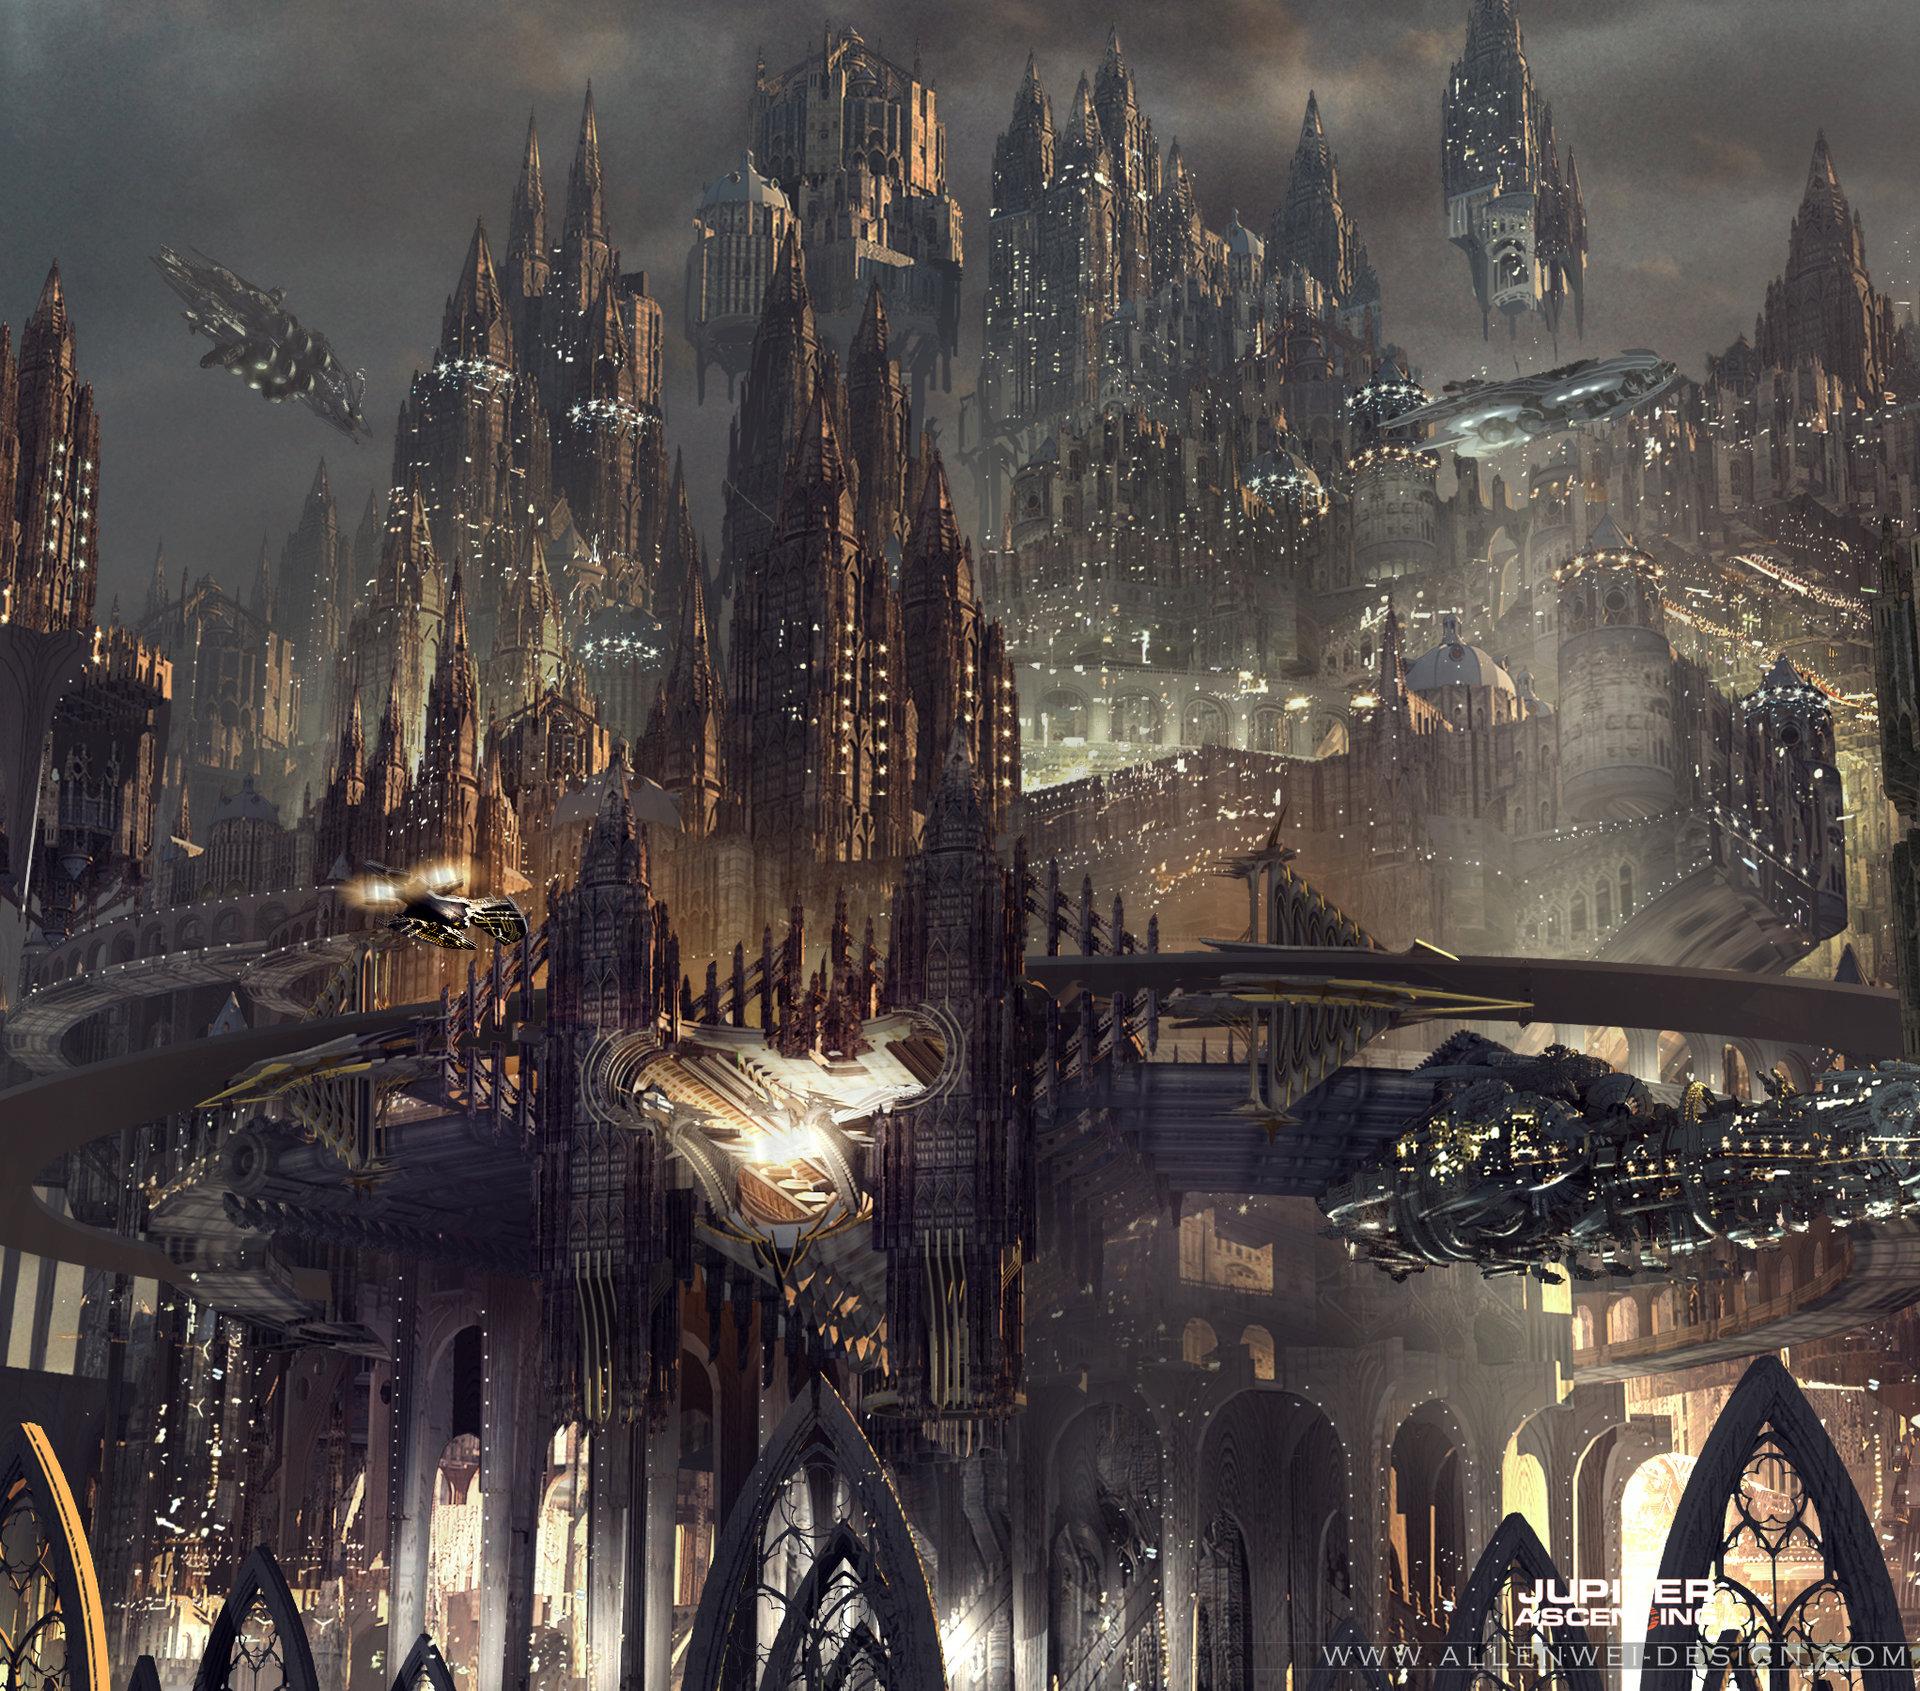 Futuristic Castle Concept Art